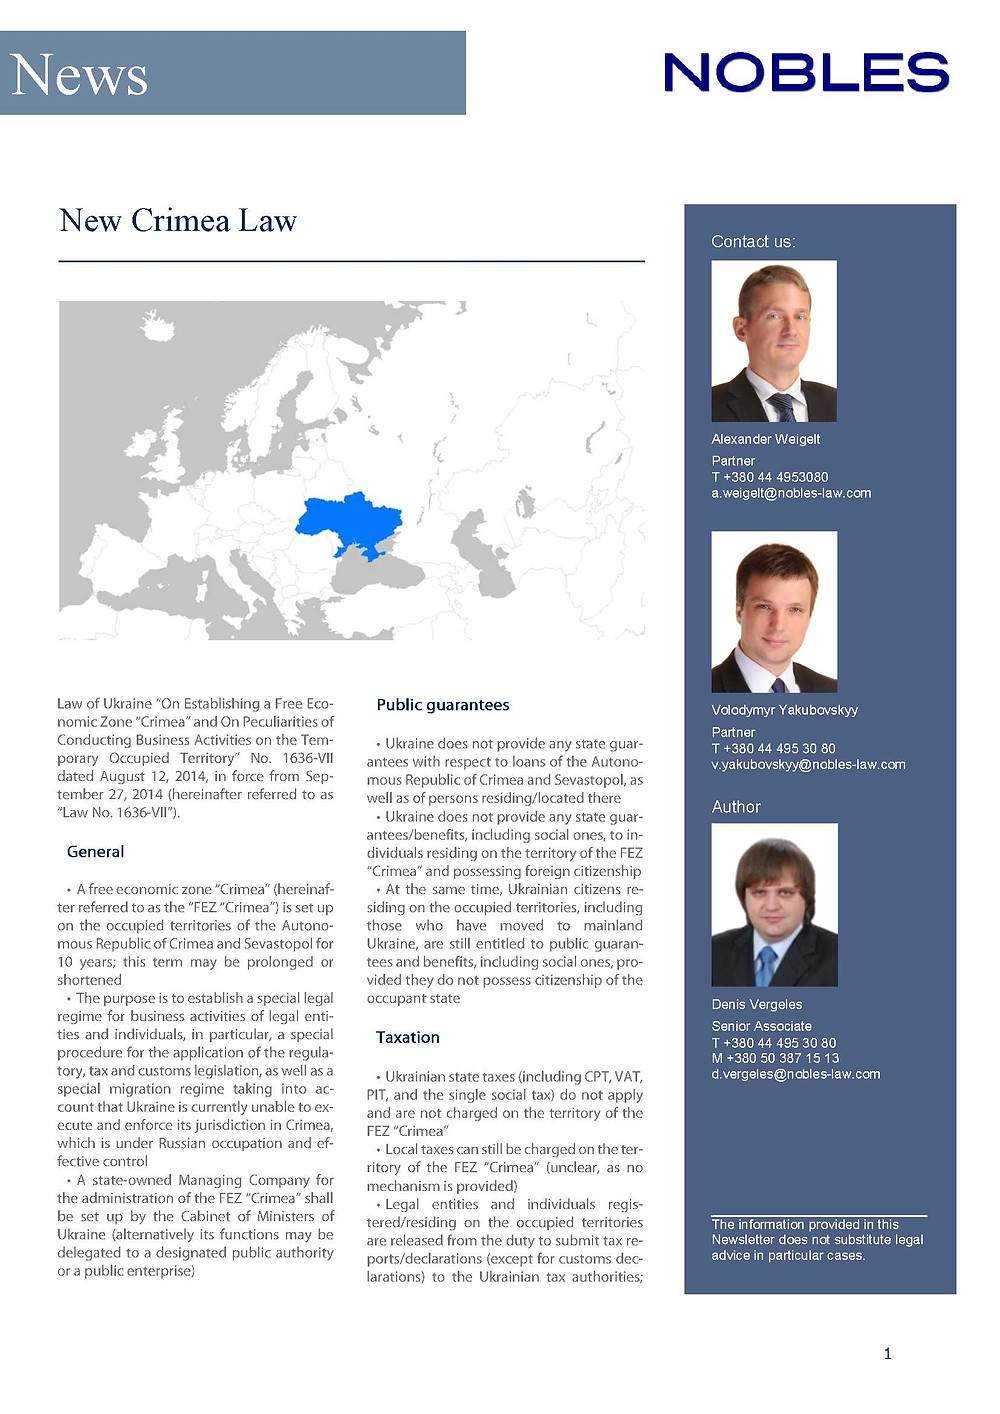 Nobles_News_-_Free_Economic_Zone_in_Crimea_–_September_2014.jpg